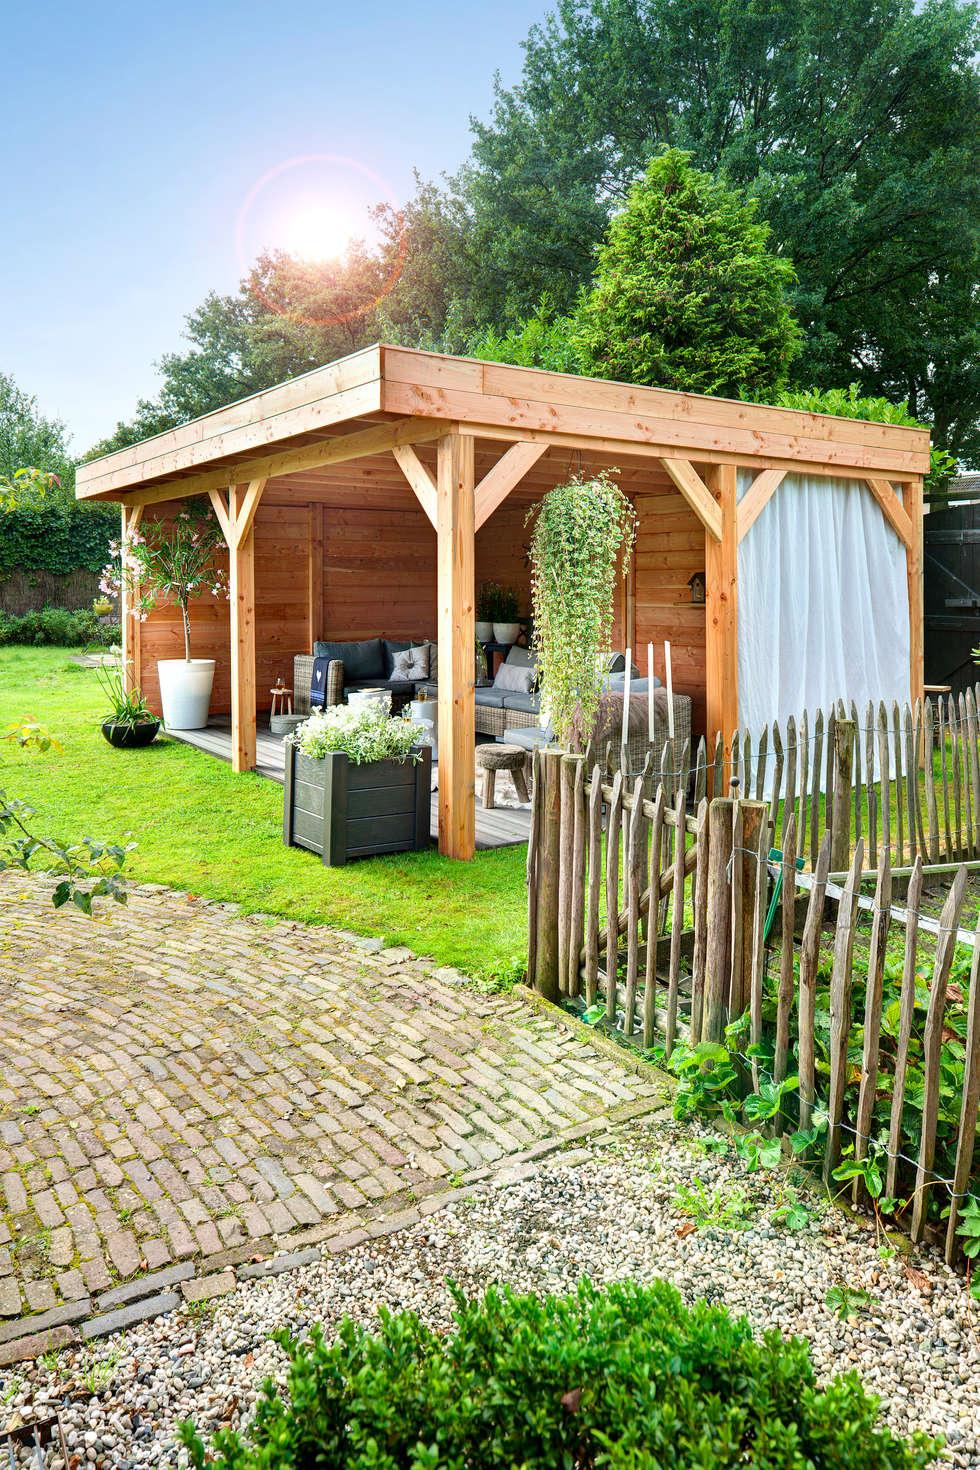 Gartenhaus Skandinavisch wohnideen interior design einrichtungsideen bilder homify